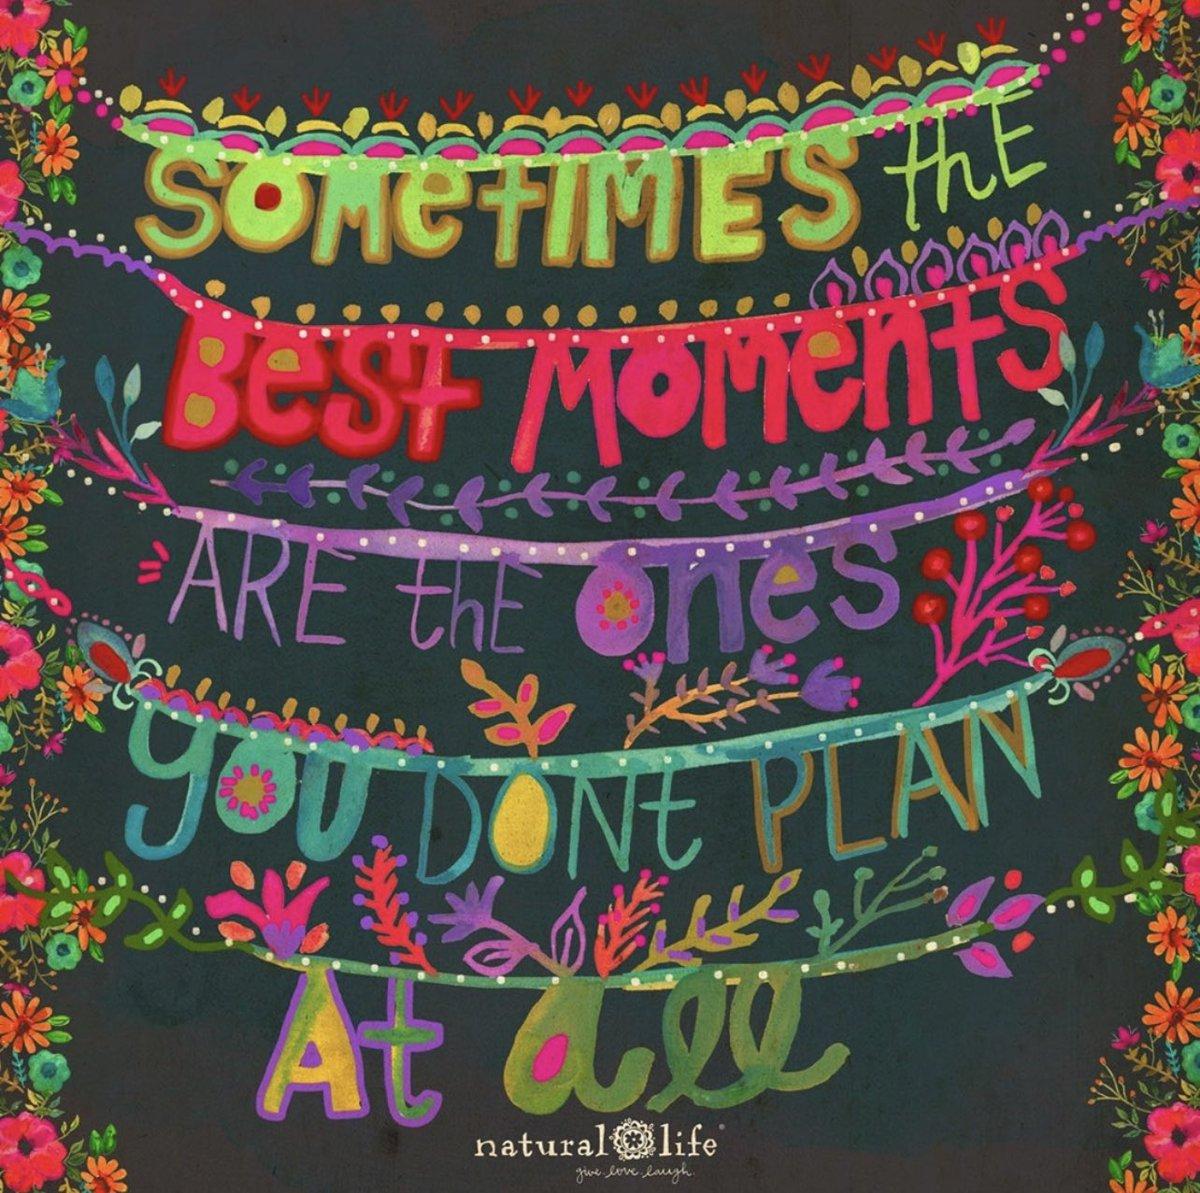 #sundayvibes Let today be spontaneous! Do things that make your heart happy with those you love!💚💕❤️#BetterTogether #AllMeansALL #Familylove @pgilders @ProfeMsVgodinez @mrsjessgomez @DrMariaMPoulin @TheColon_s @RosaIsiah @DrRenaeBryant @drrmonarrez @APRoRodriguez @Walker1Dr